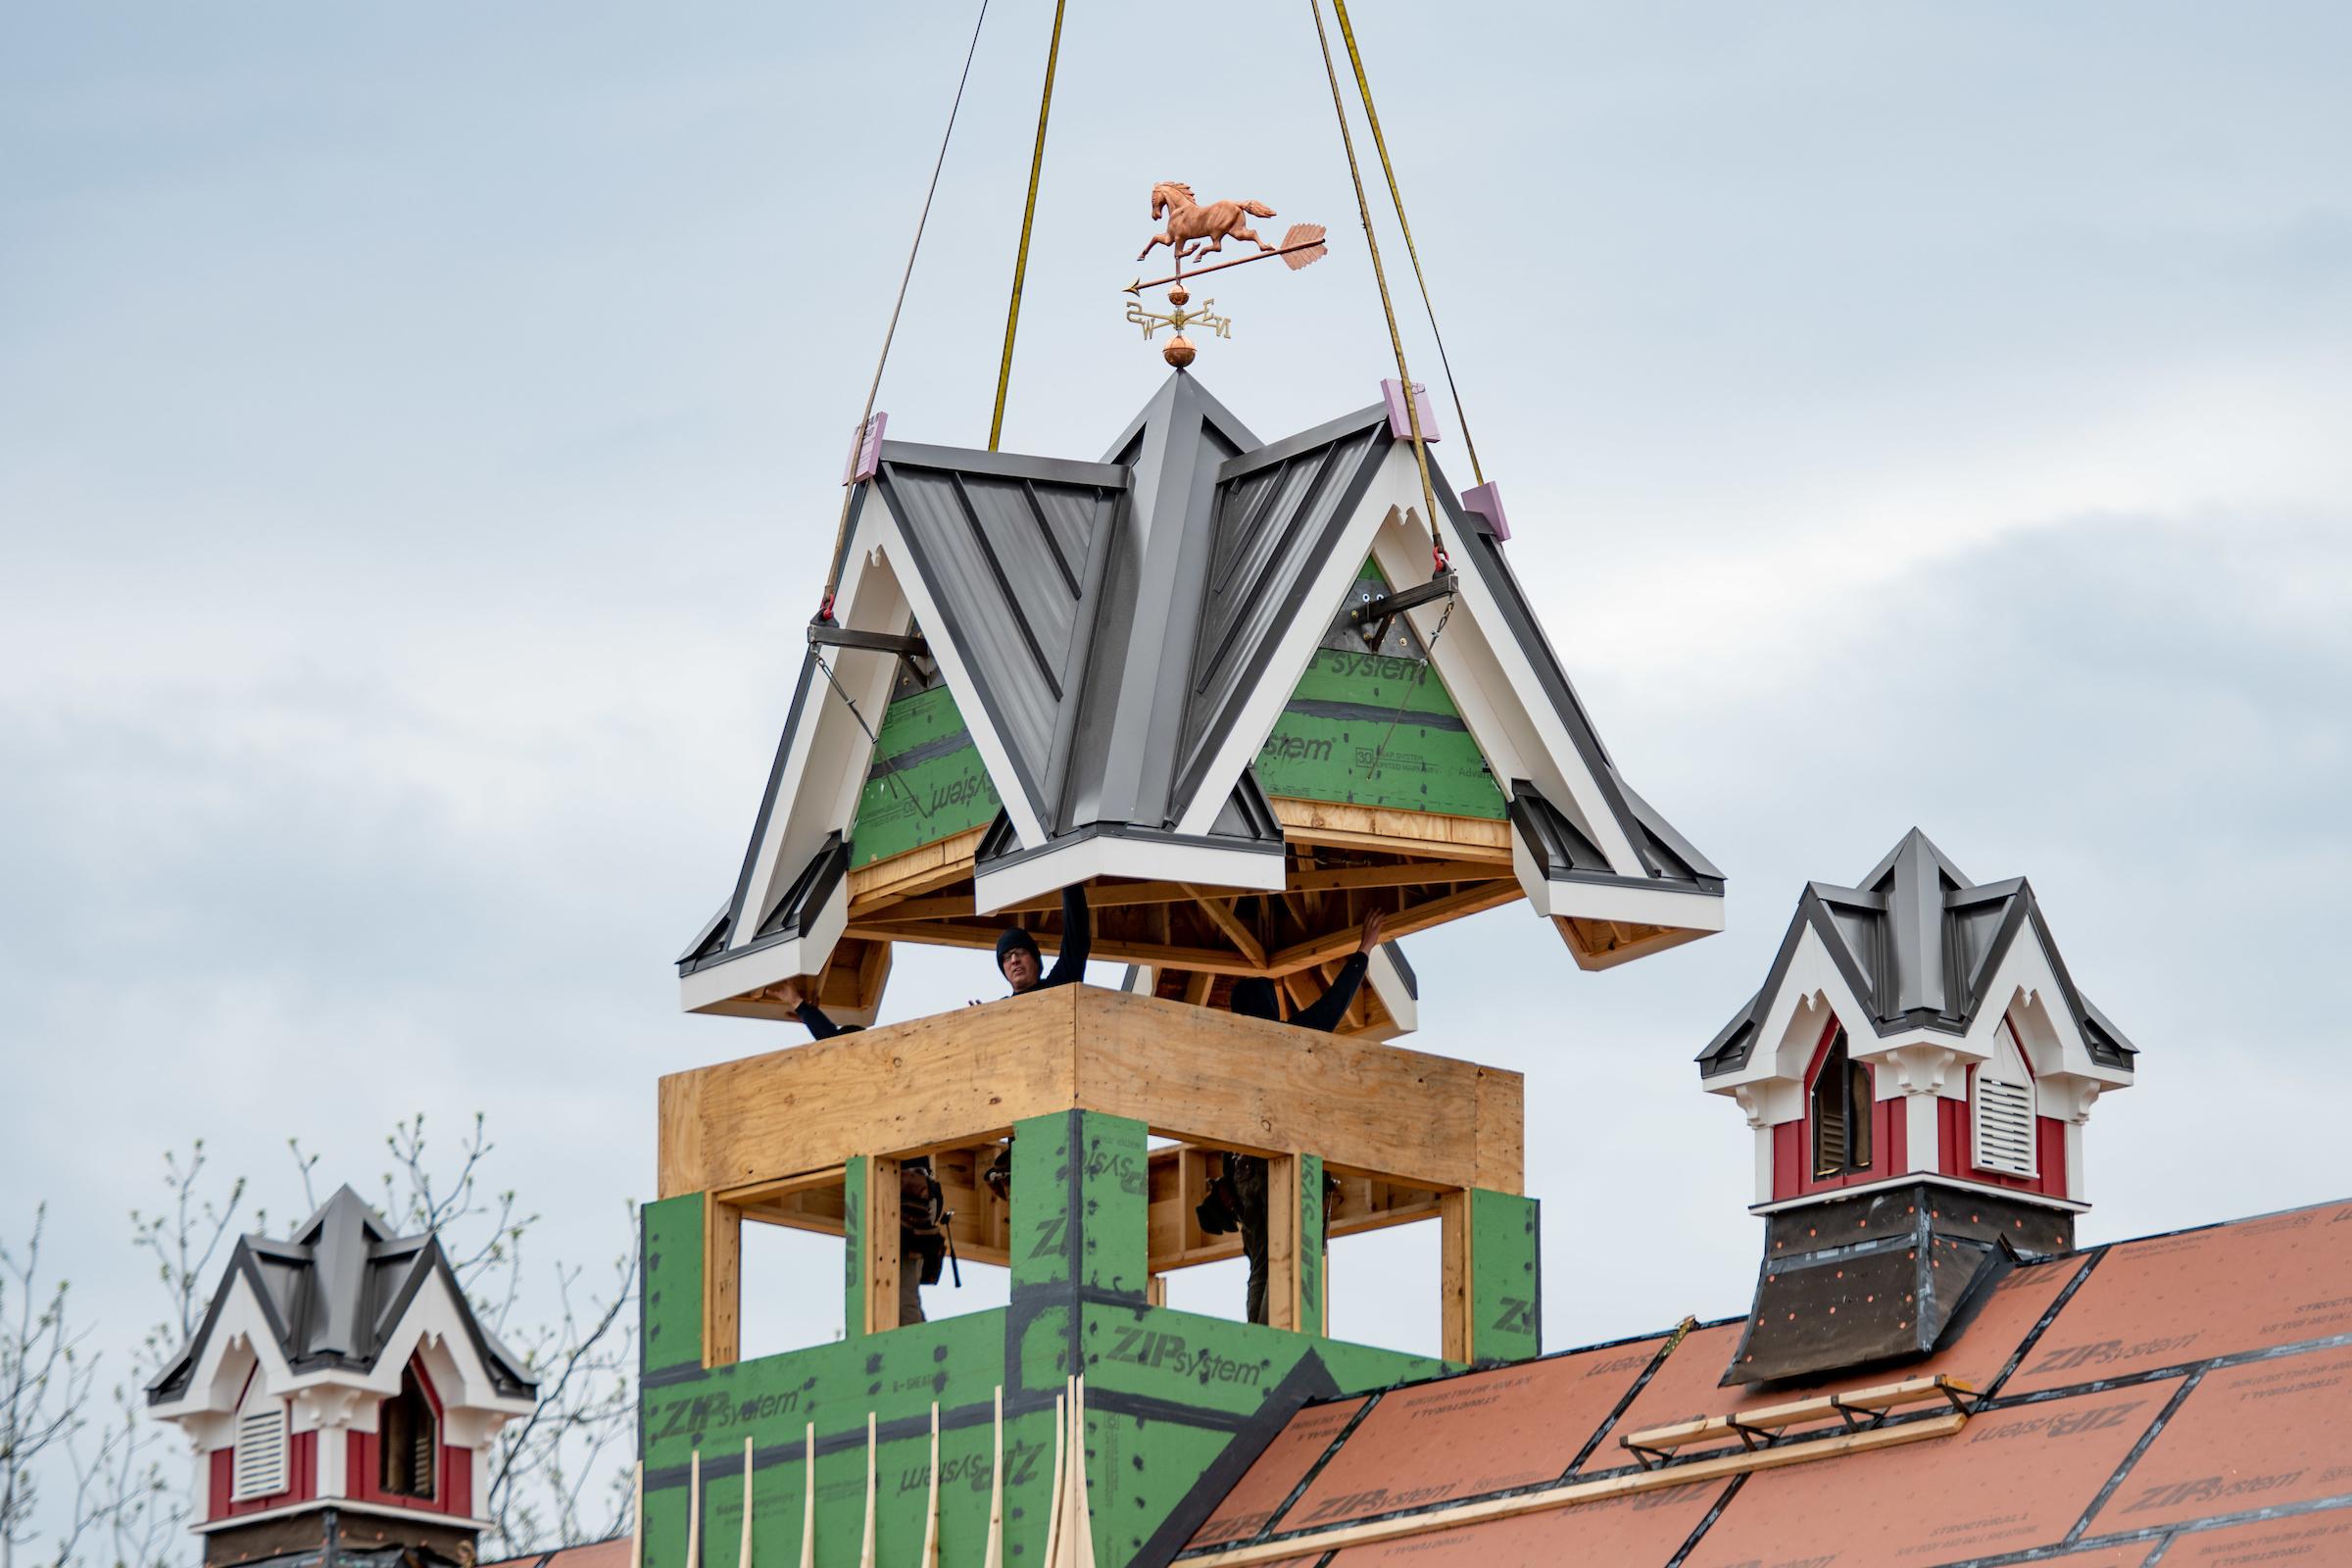 5.8.19 Belzowski Barn Cupolas 73.jpg